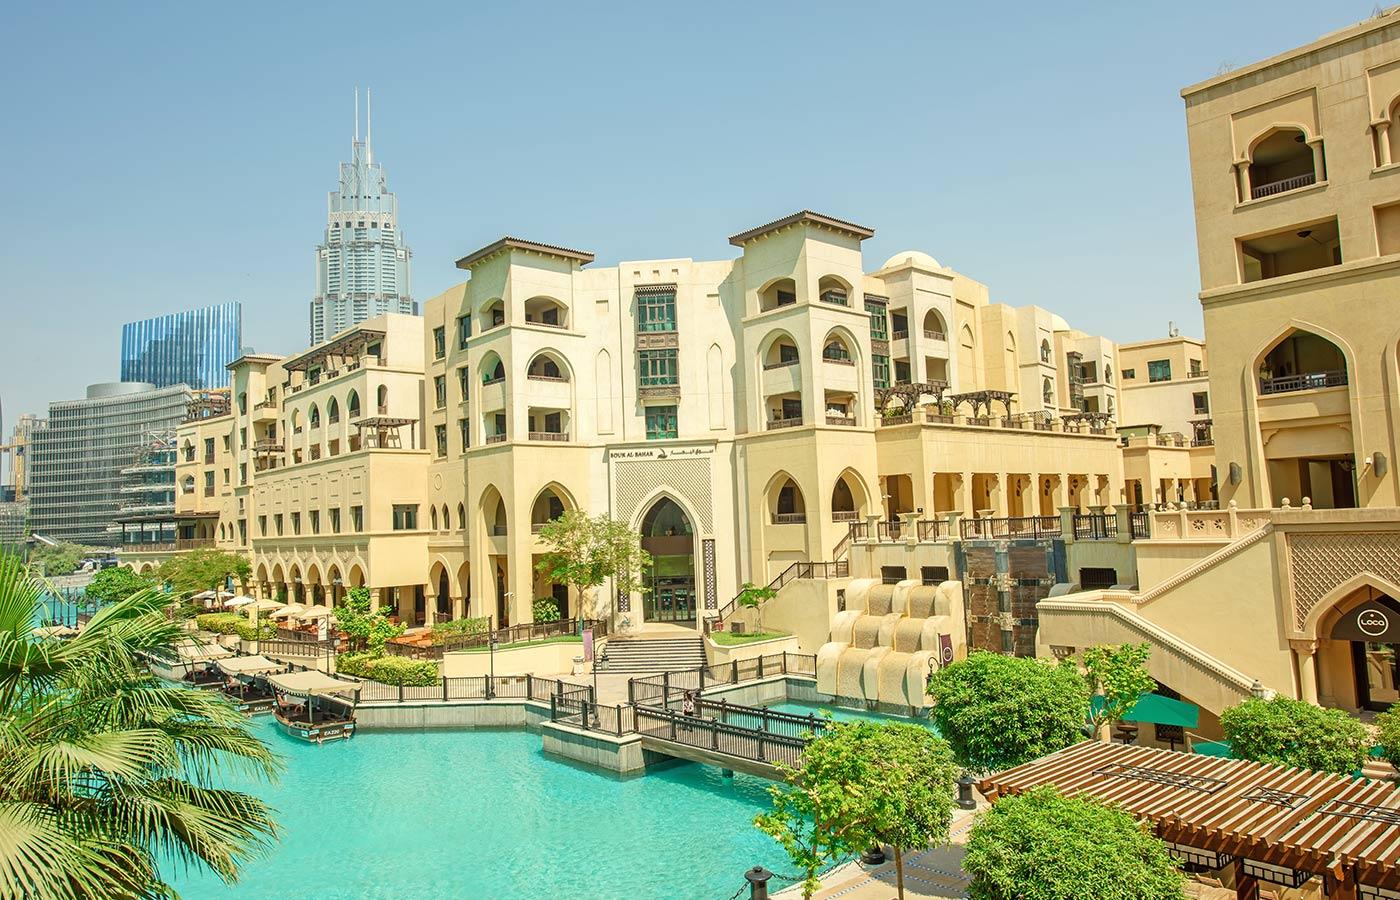 Souk AL Bahar is amidst with Burj Khalifa and the Dubai Mall